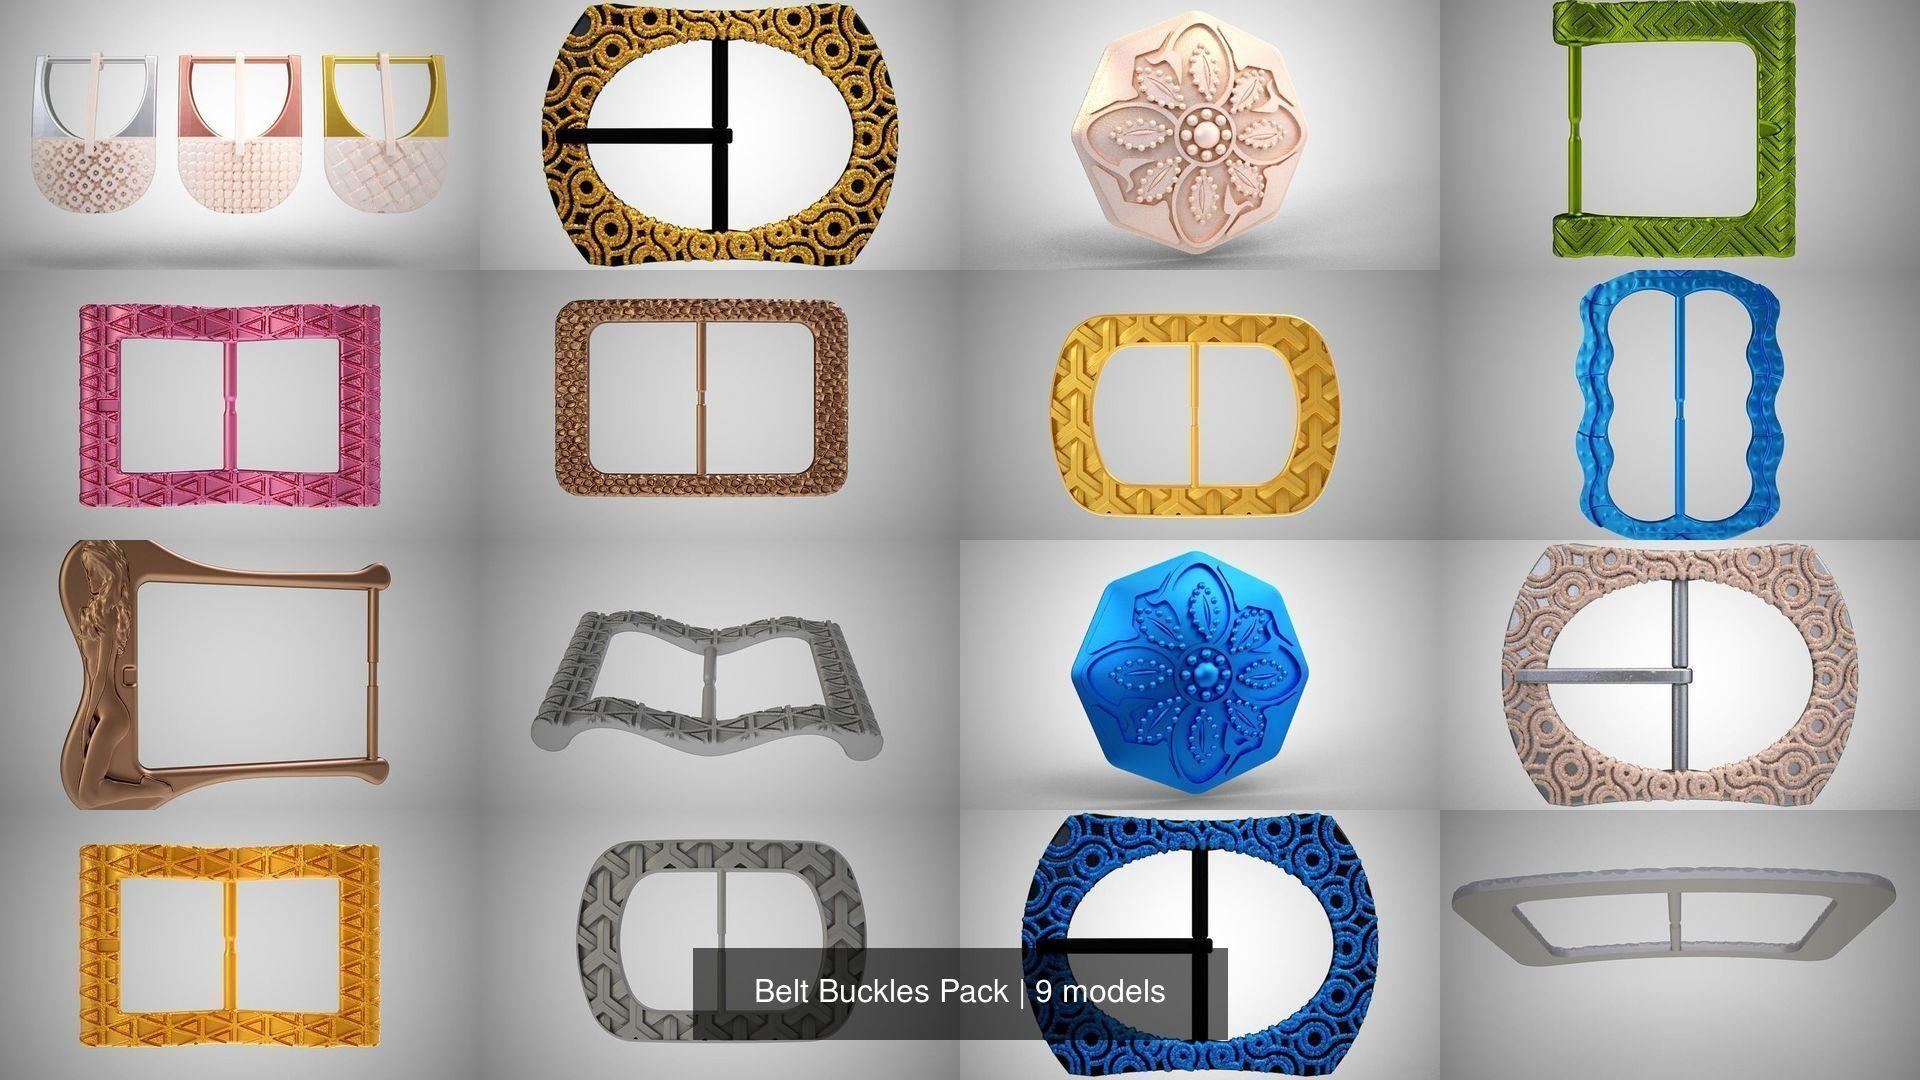 Belt Buckles Pack